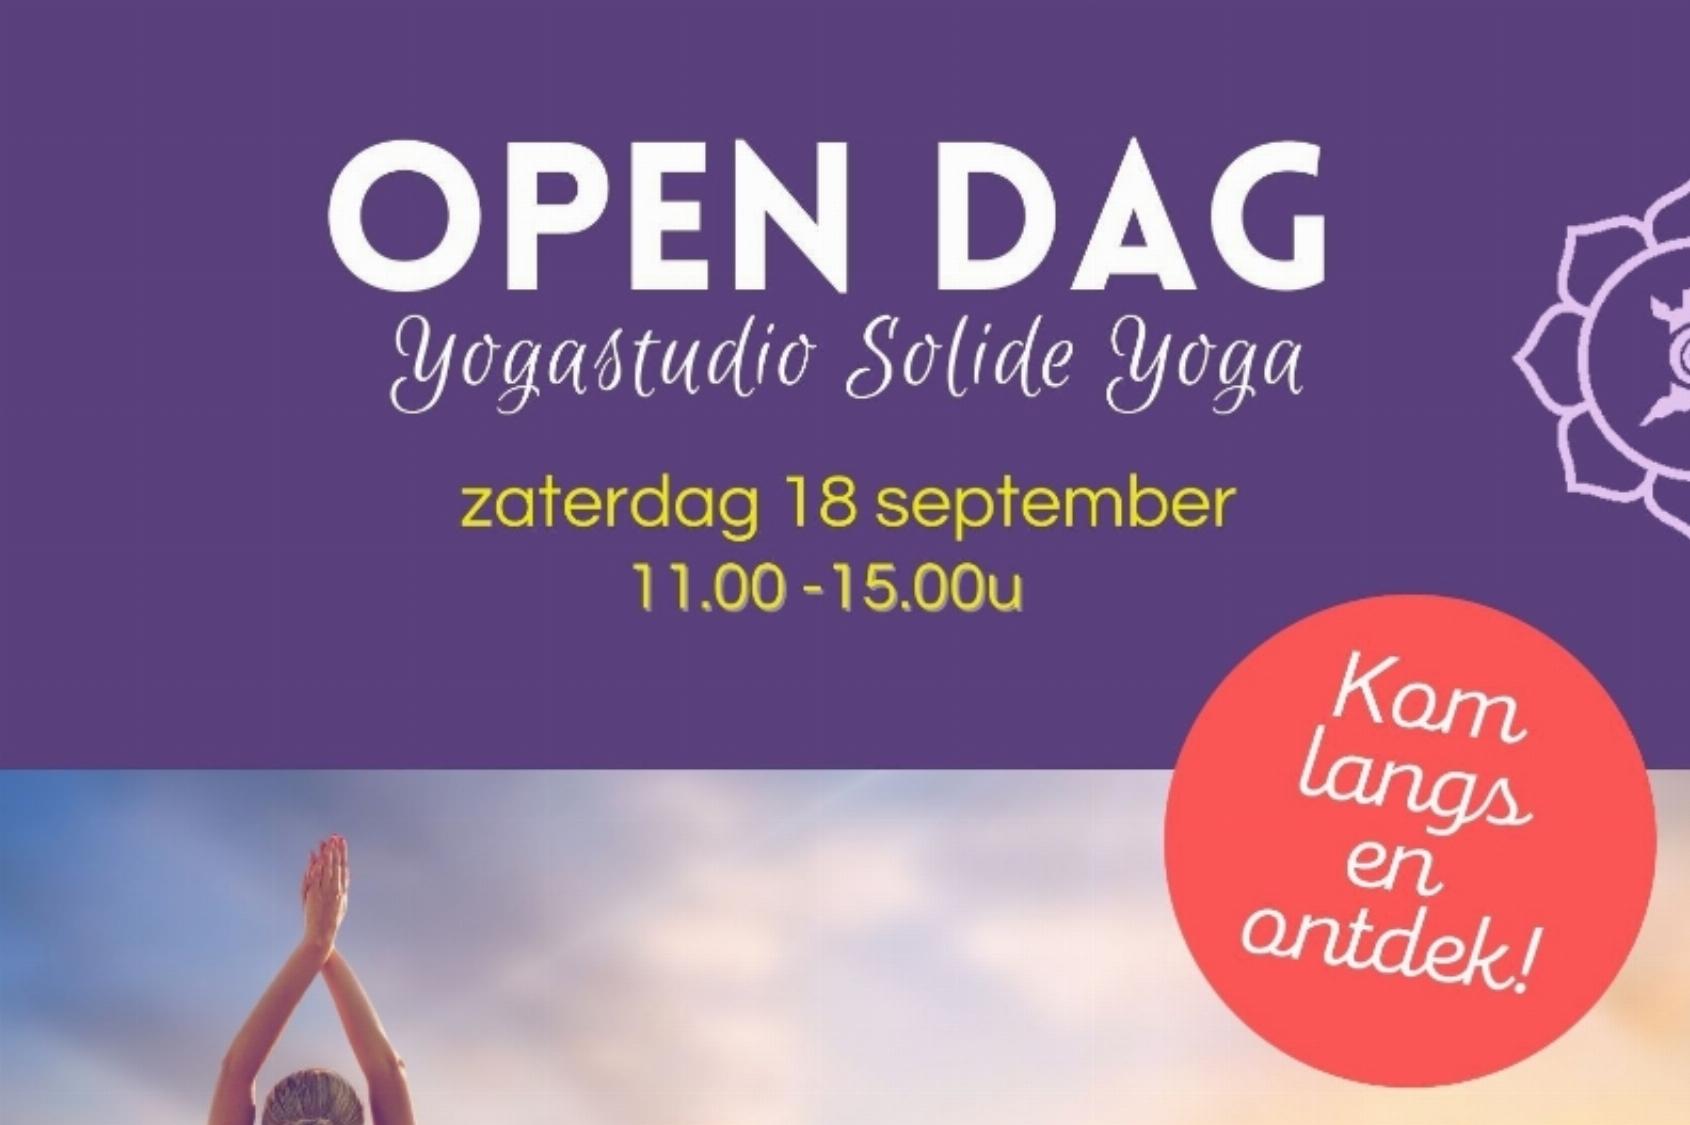 Open Dag Yogaschool Solide Yoga